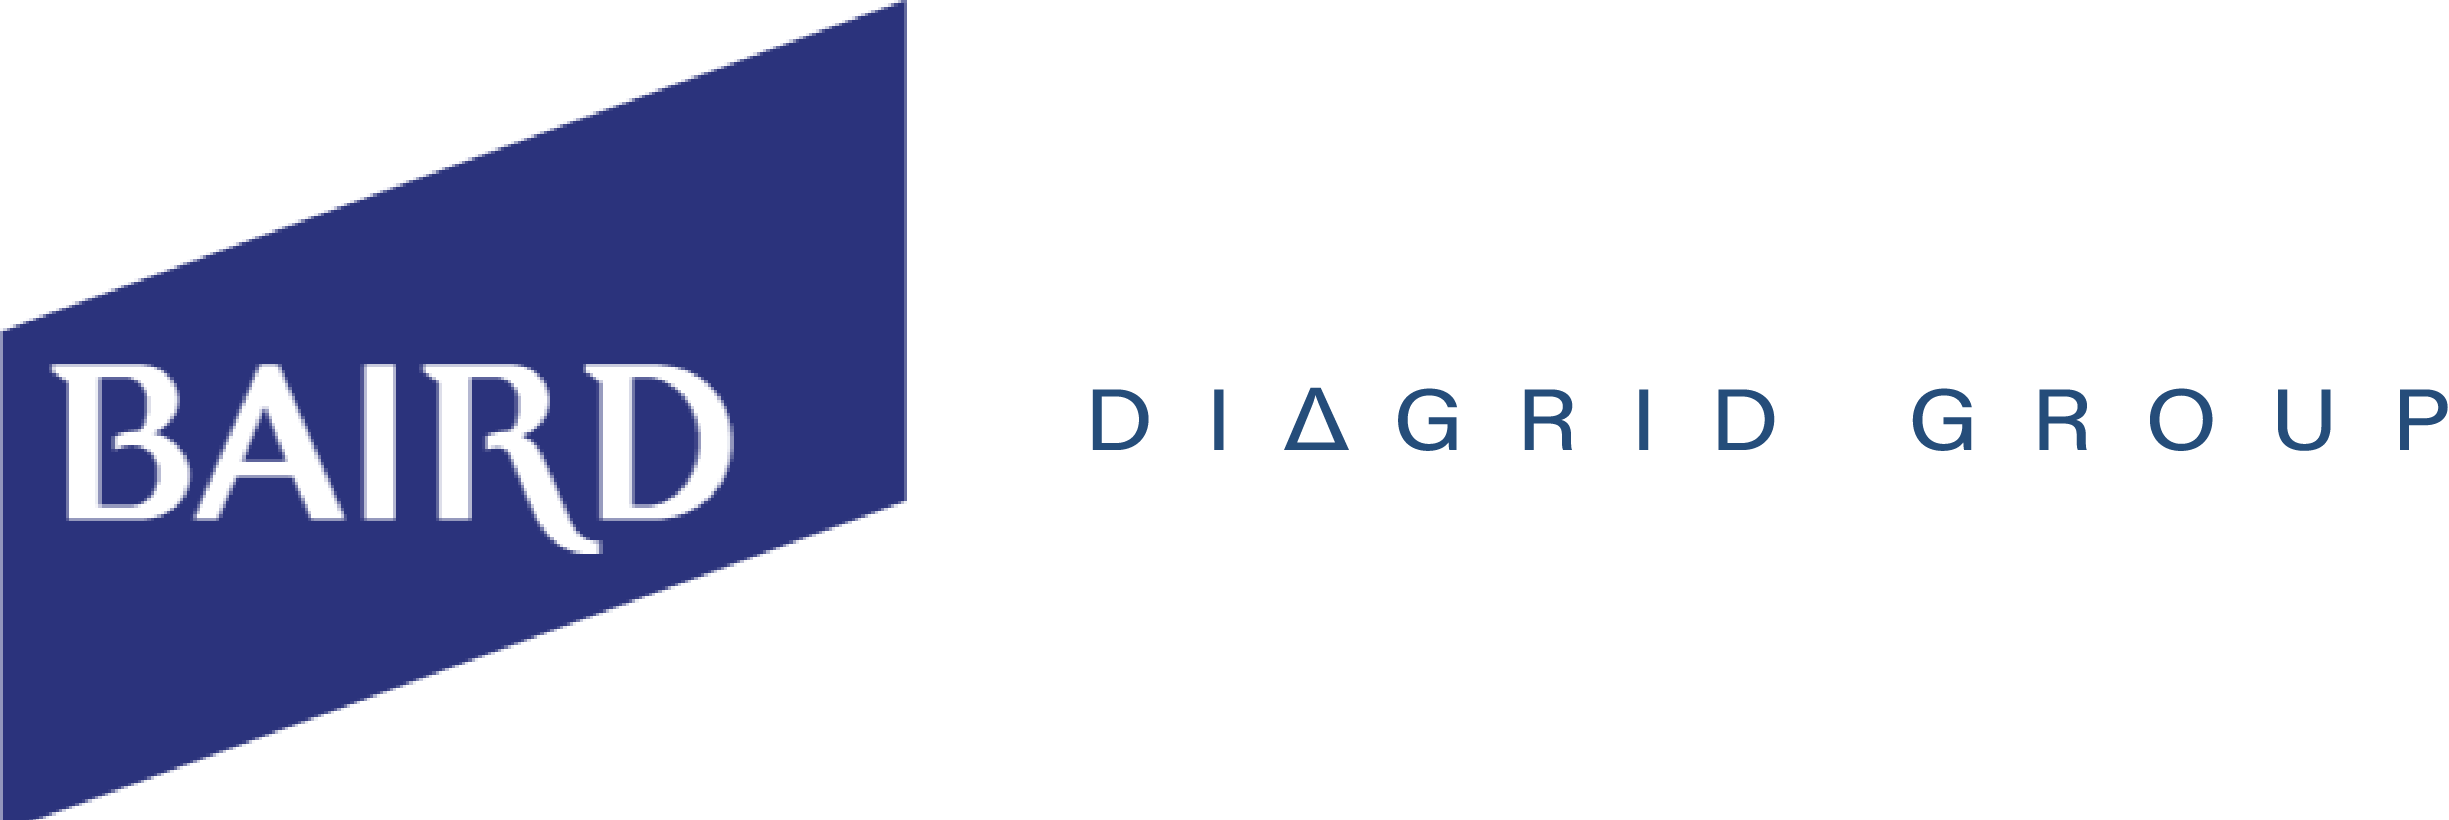 Logo for Diagrid Group